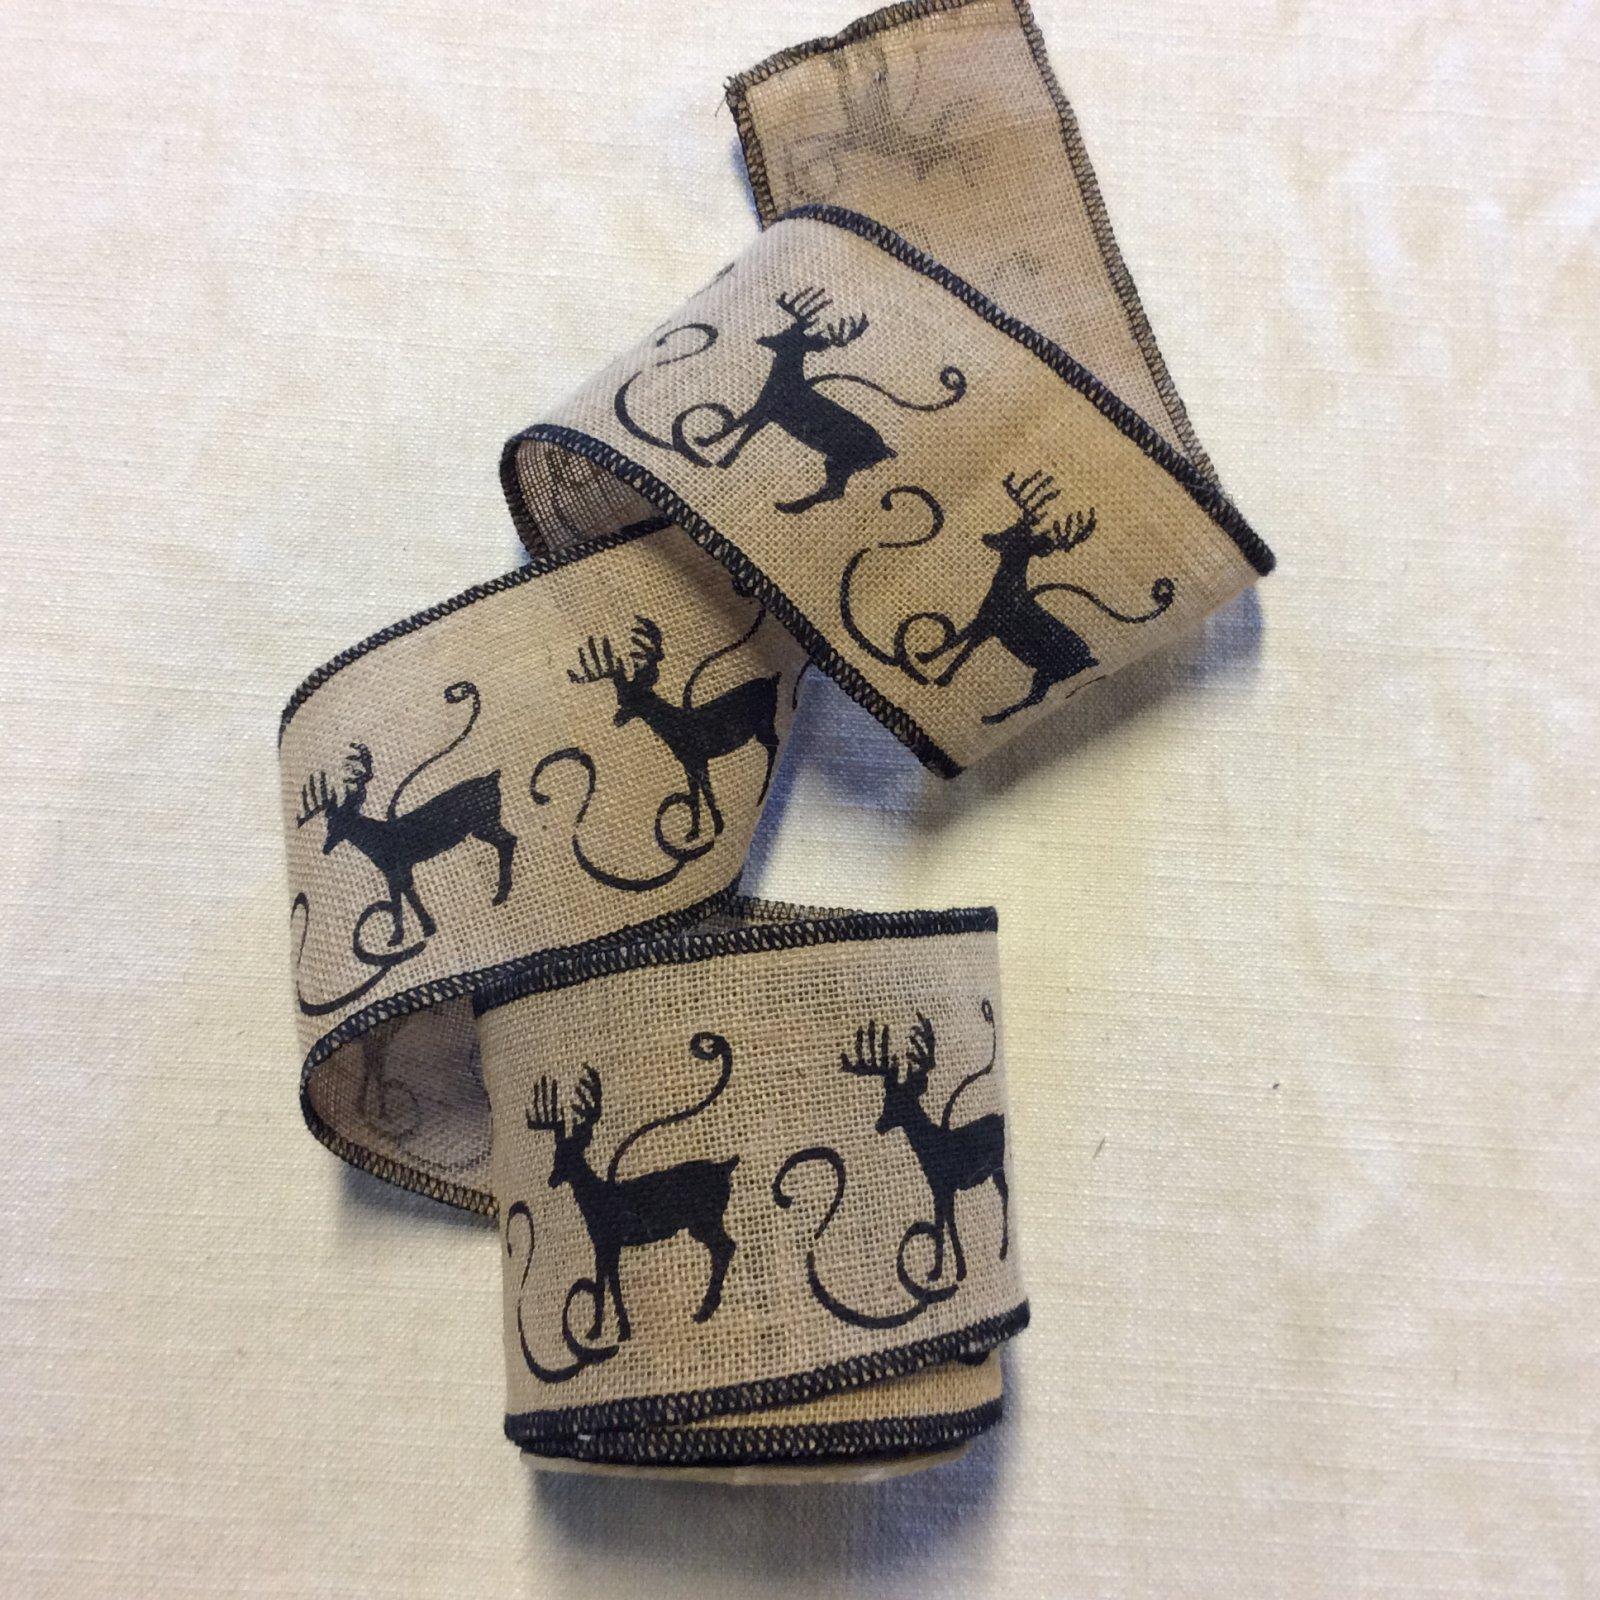 Holiday Burlap Reindeer Christmas Black and Natural Ribbon Decor Trim RIB1368